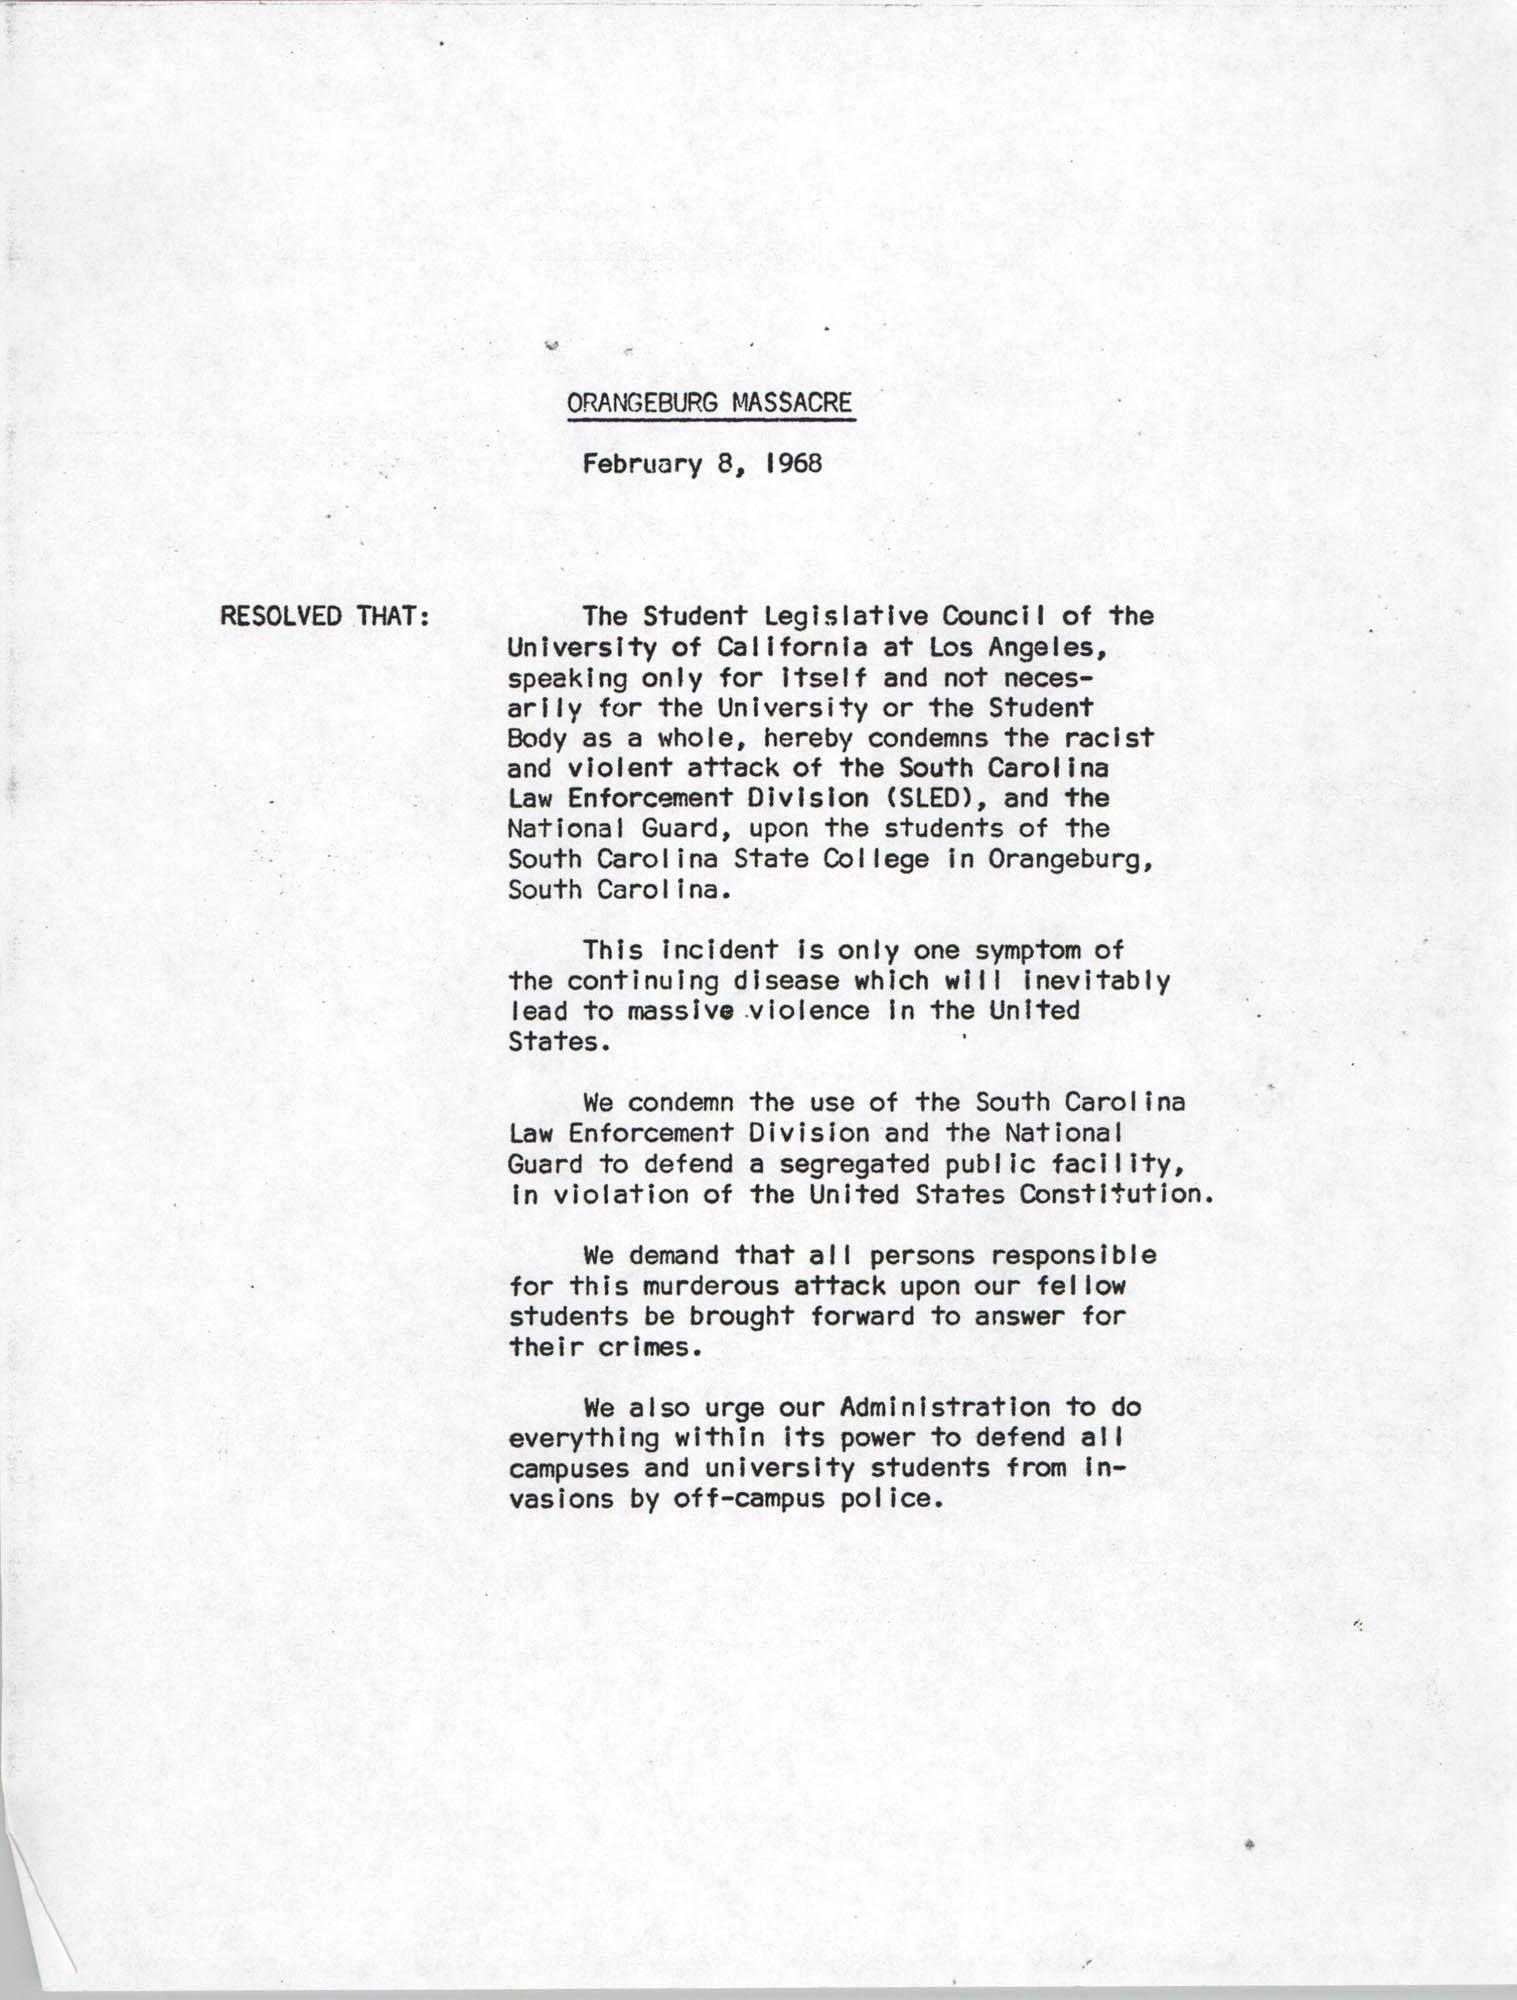 Orangeburg Massacre Resolution